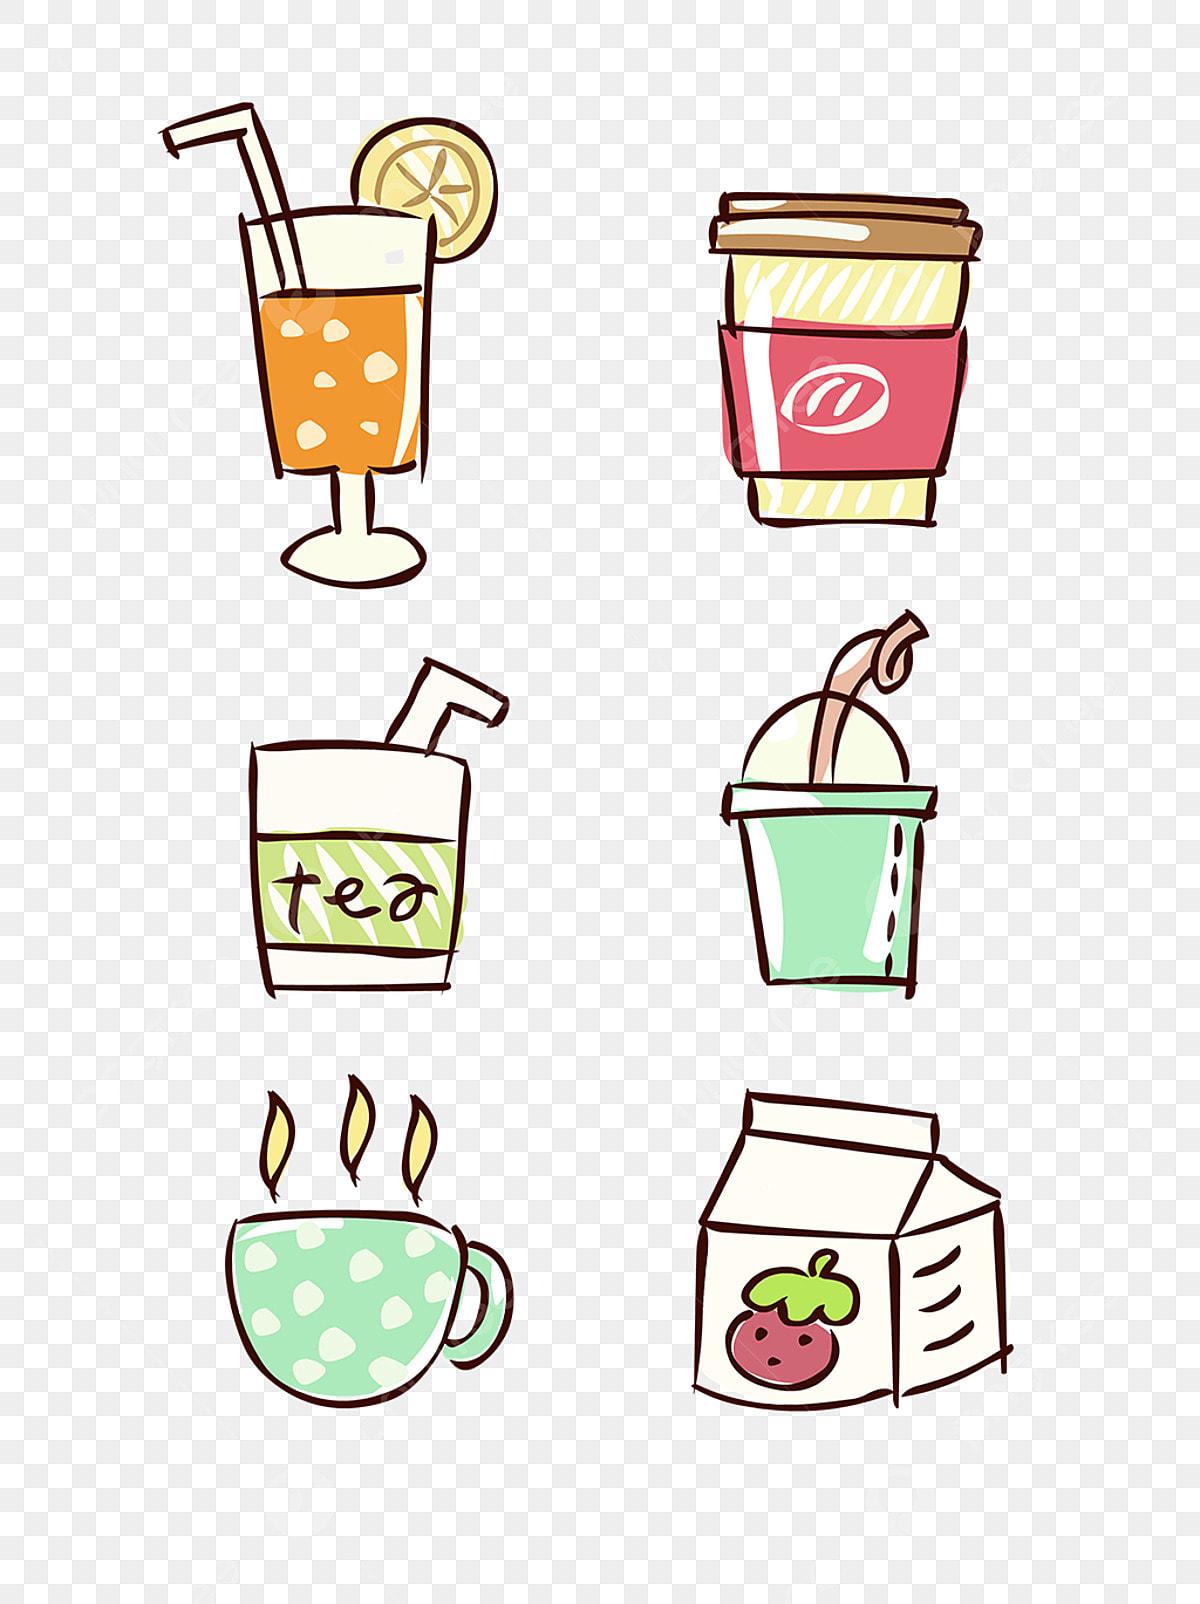 Unsur Makanan Tangan Ditarik Siri Minuman Kartun Comel Elemen